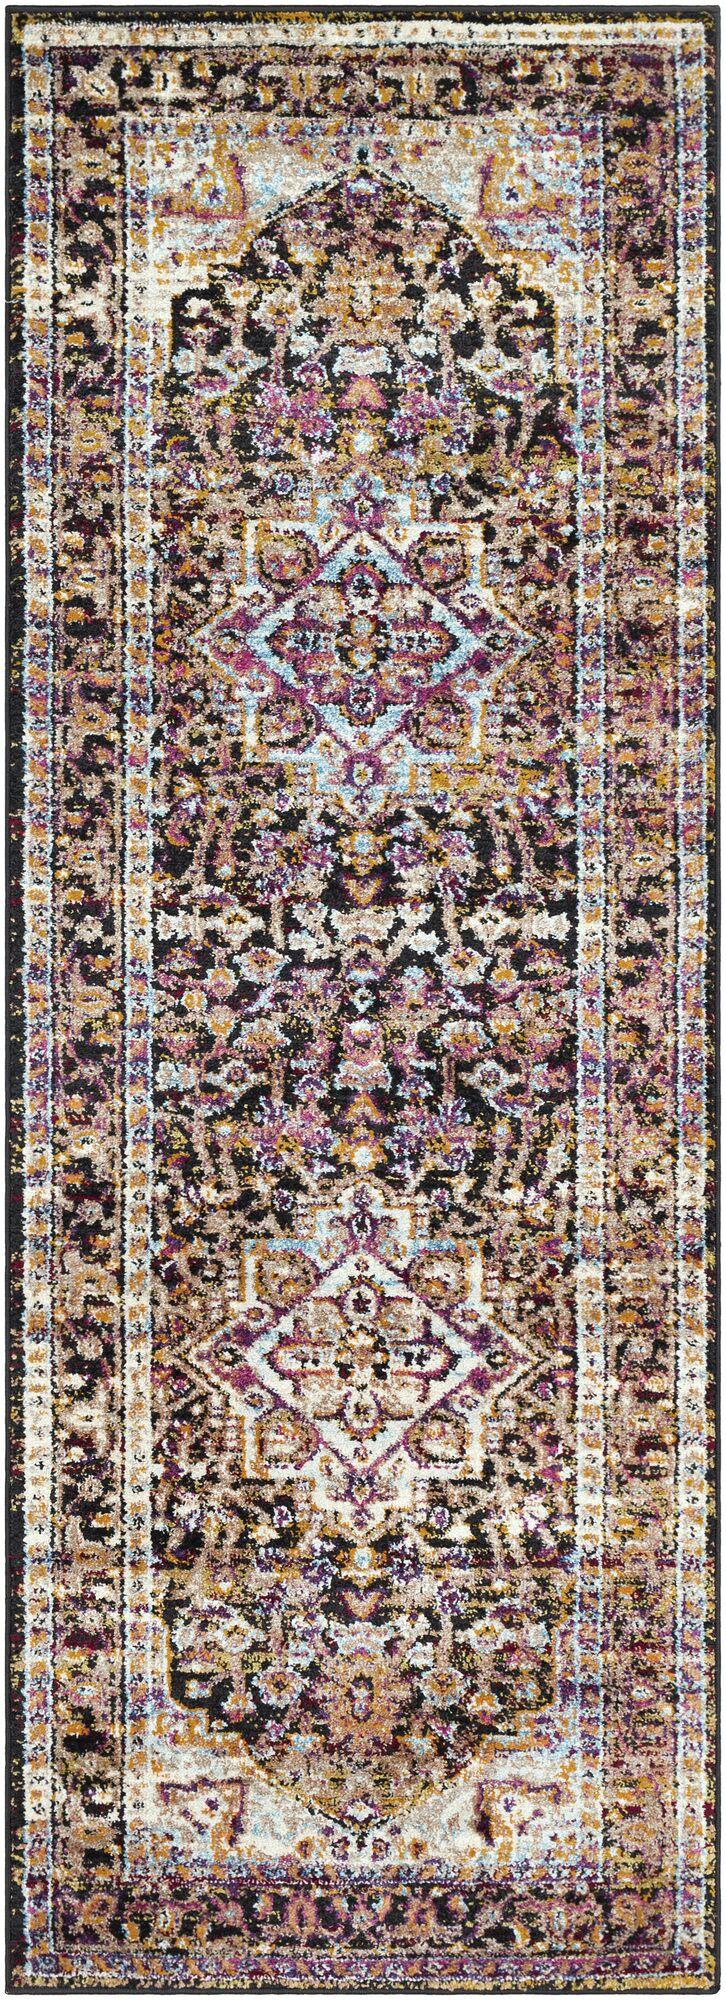 Walferdange Transitional Bright Pink/Blue/Yellow Area Rug Rug Size: Rectangle 5' x 7'3